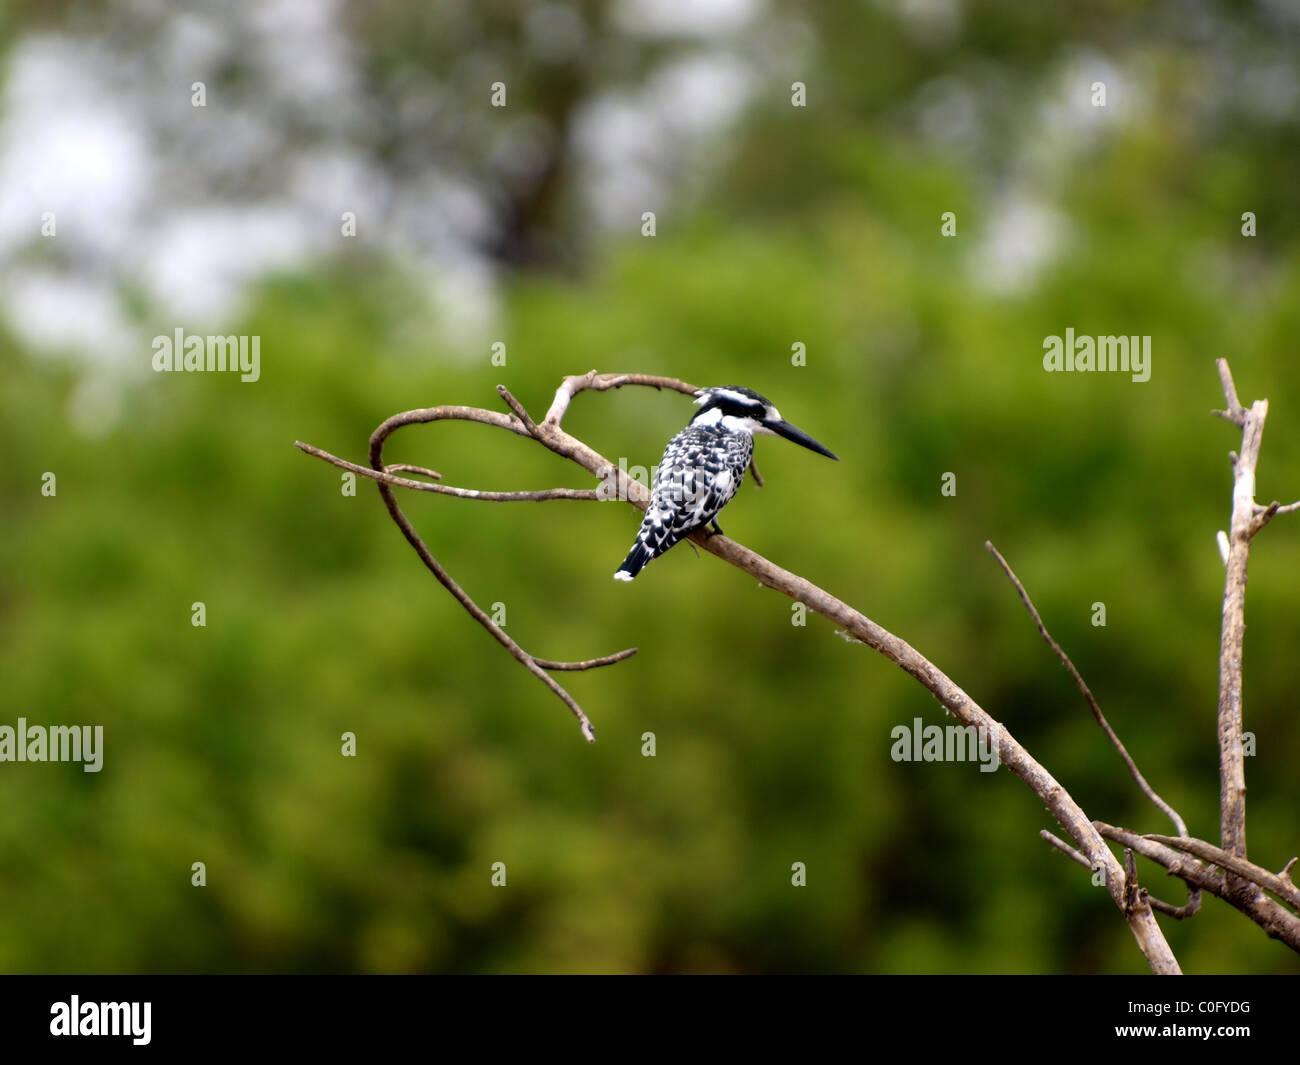 Pied kingfisher - Stock Image